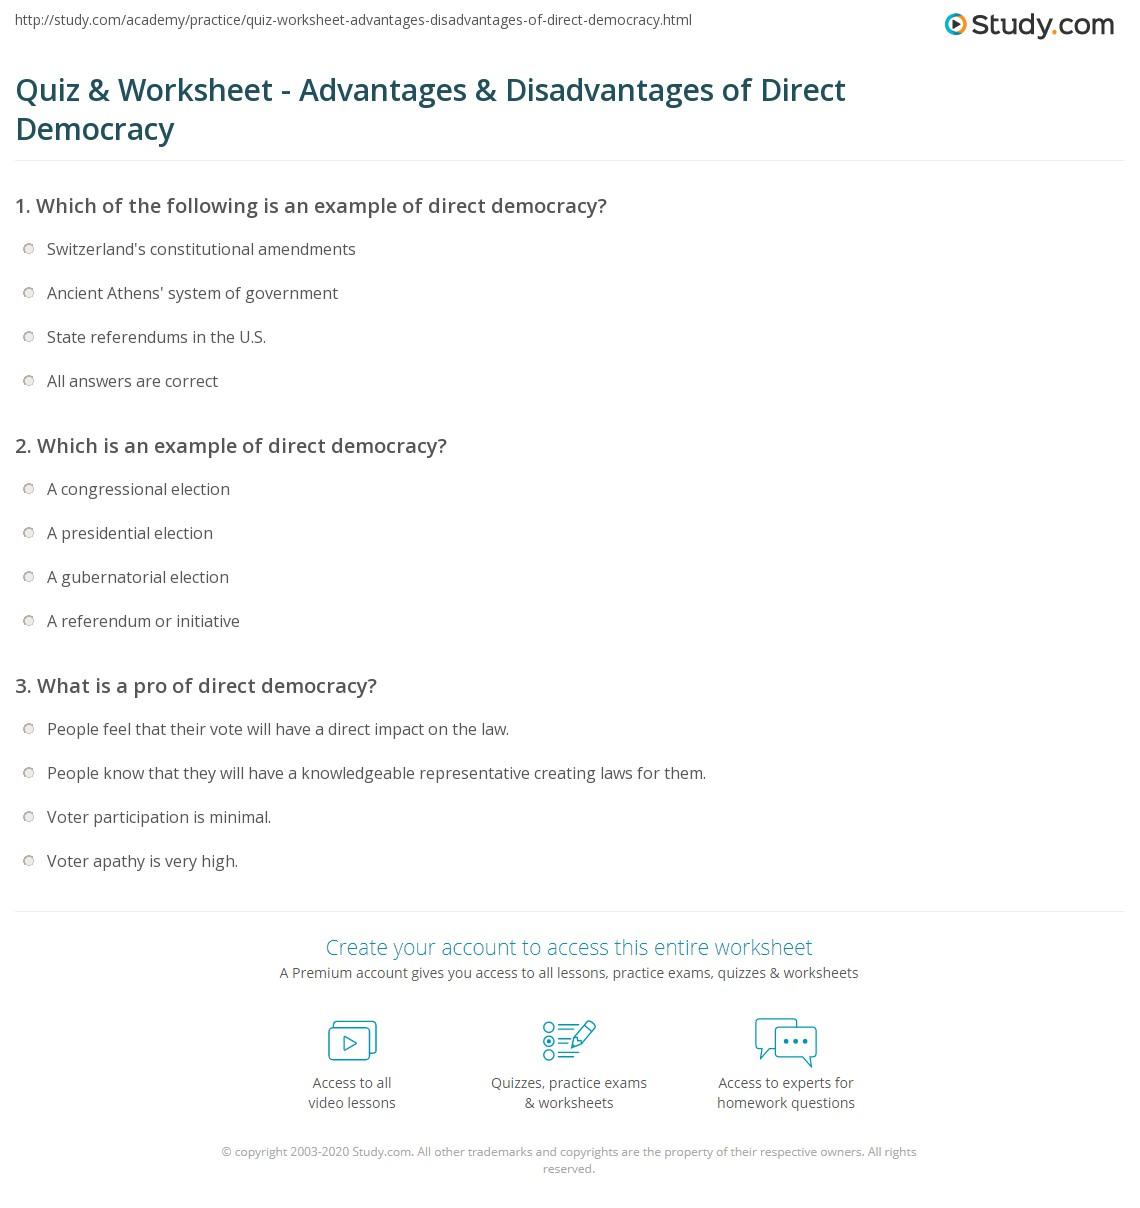 quiz & worksheet - advantages & disadvantages of direct democracy